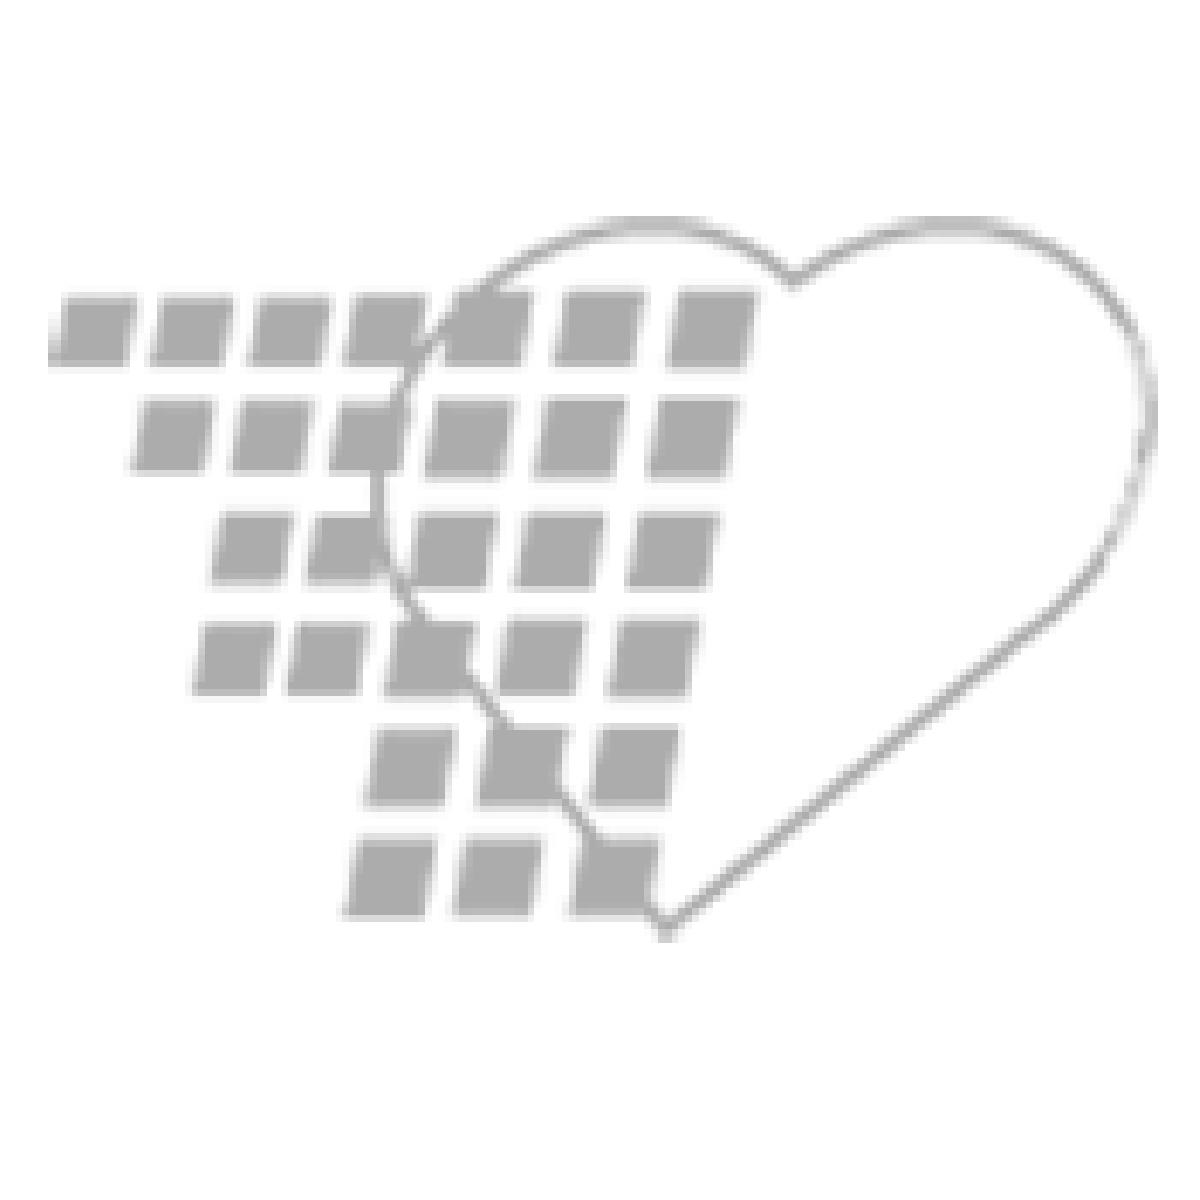 06-93-0069 - Demo Dose® Cephalexn 500 mg - 1000 Pills/Jar